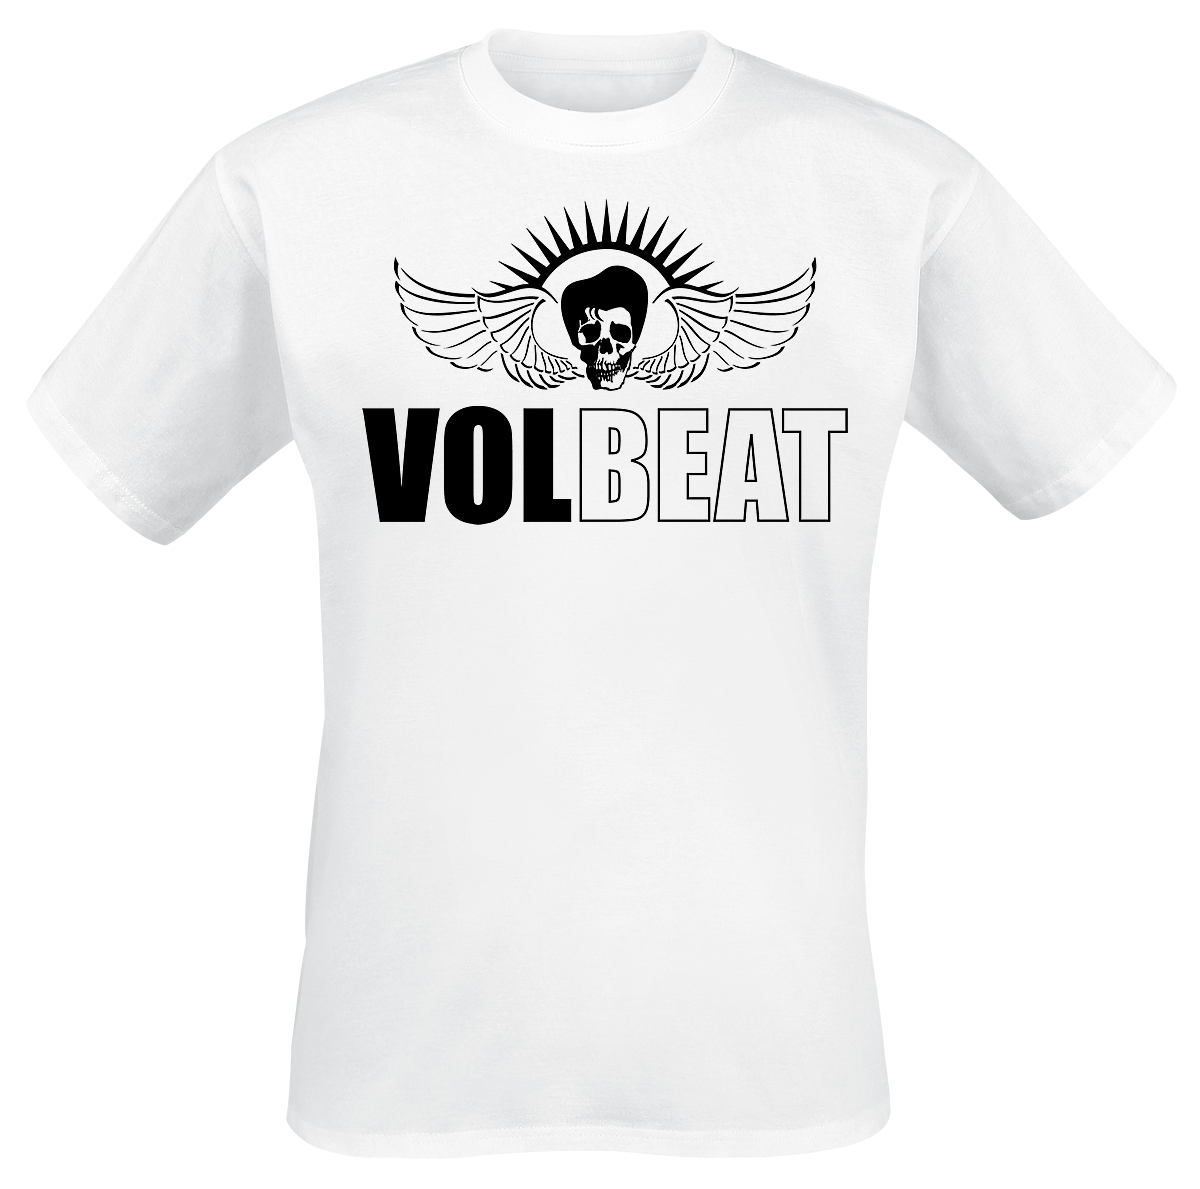 Volbeat - Classic Logo - T-Shirt - white image